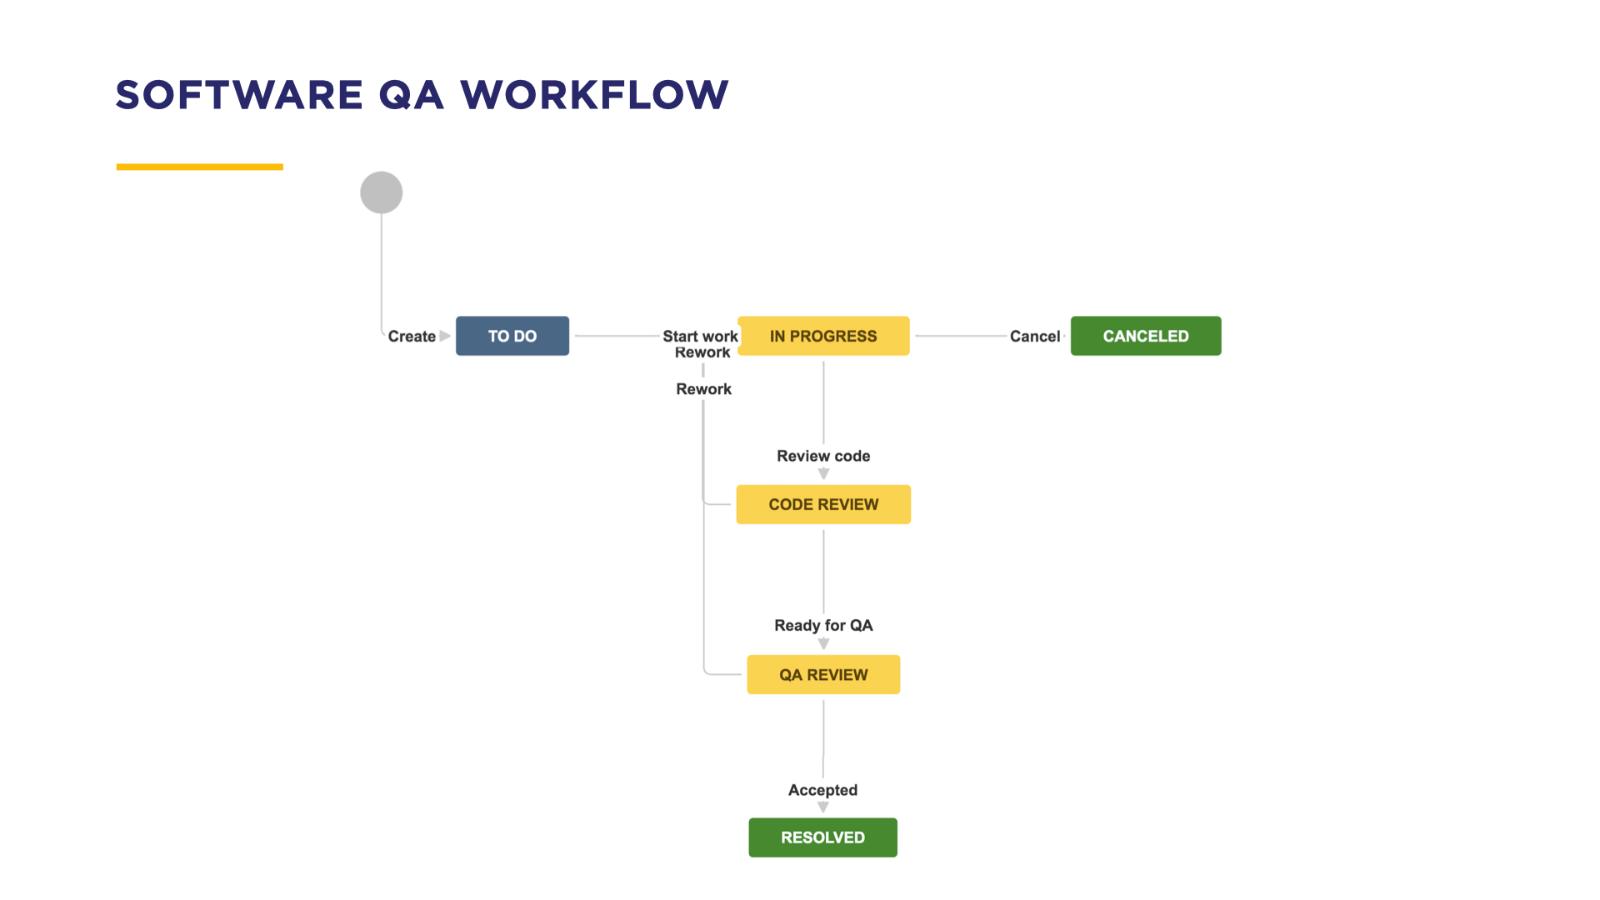 ProForma: Software QA Workflow